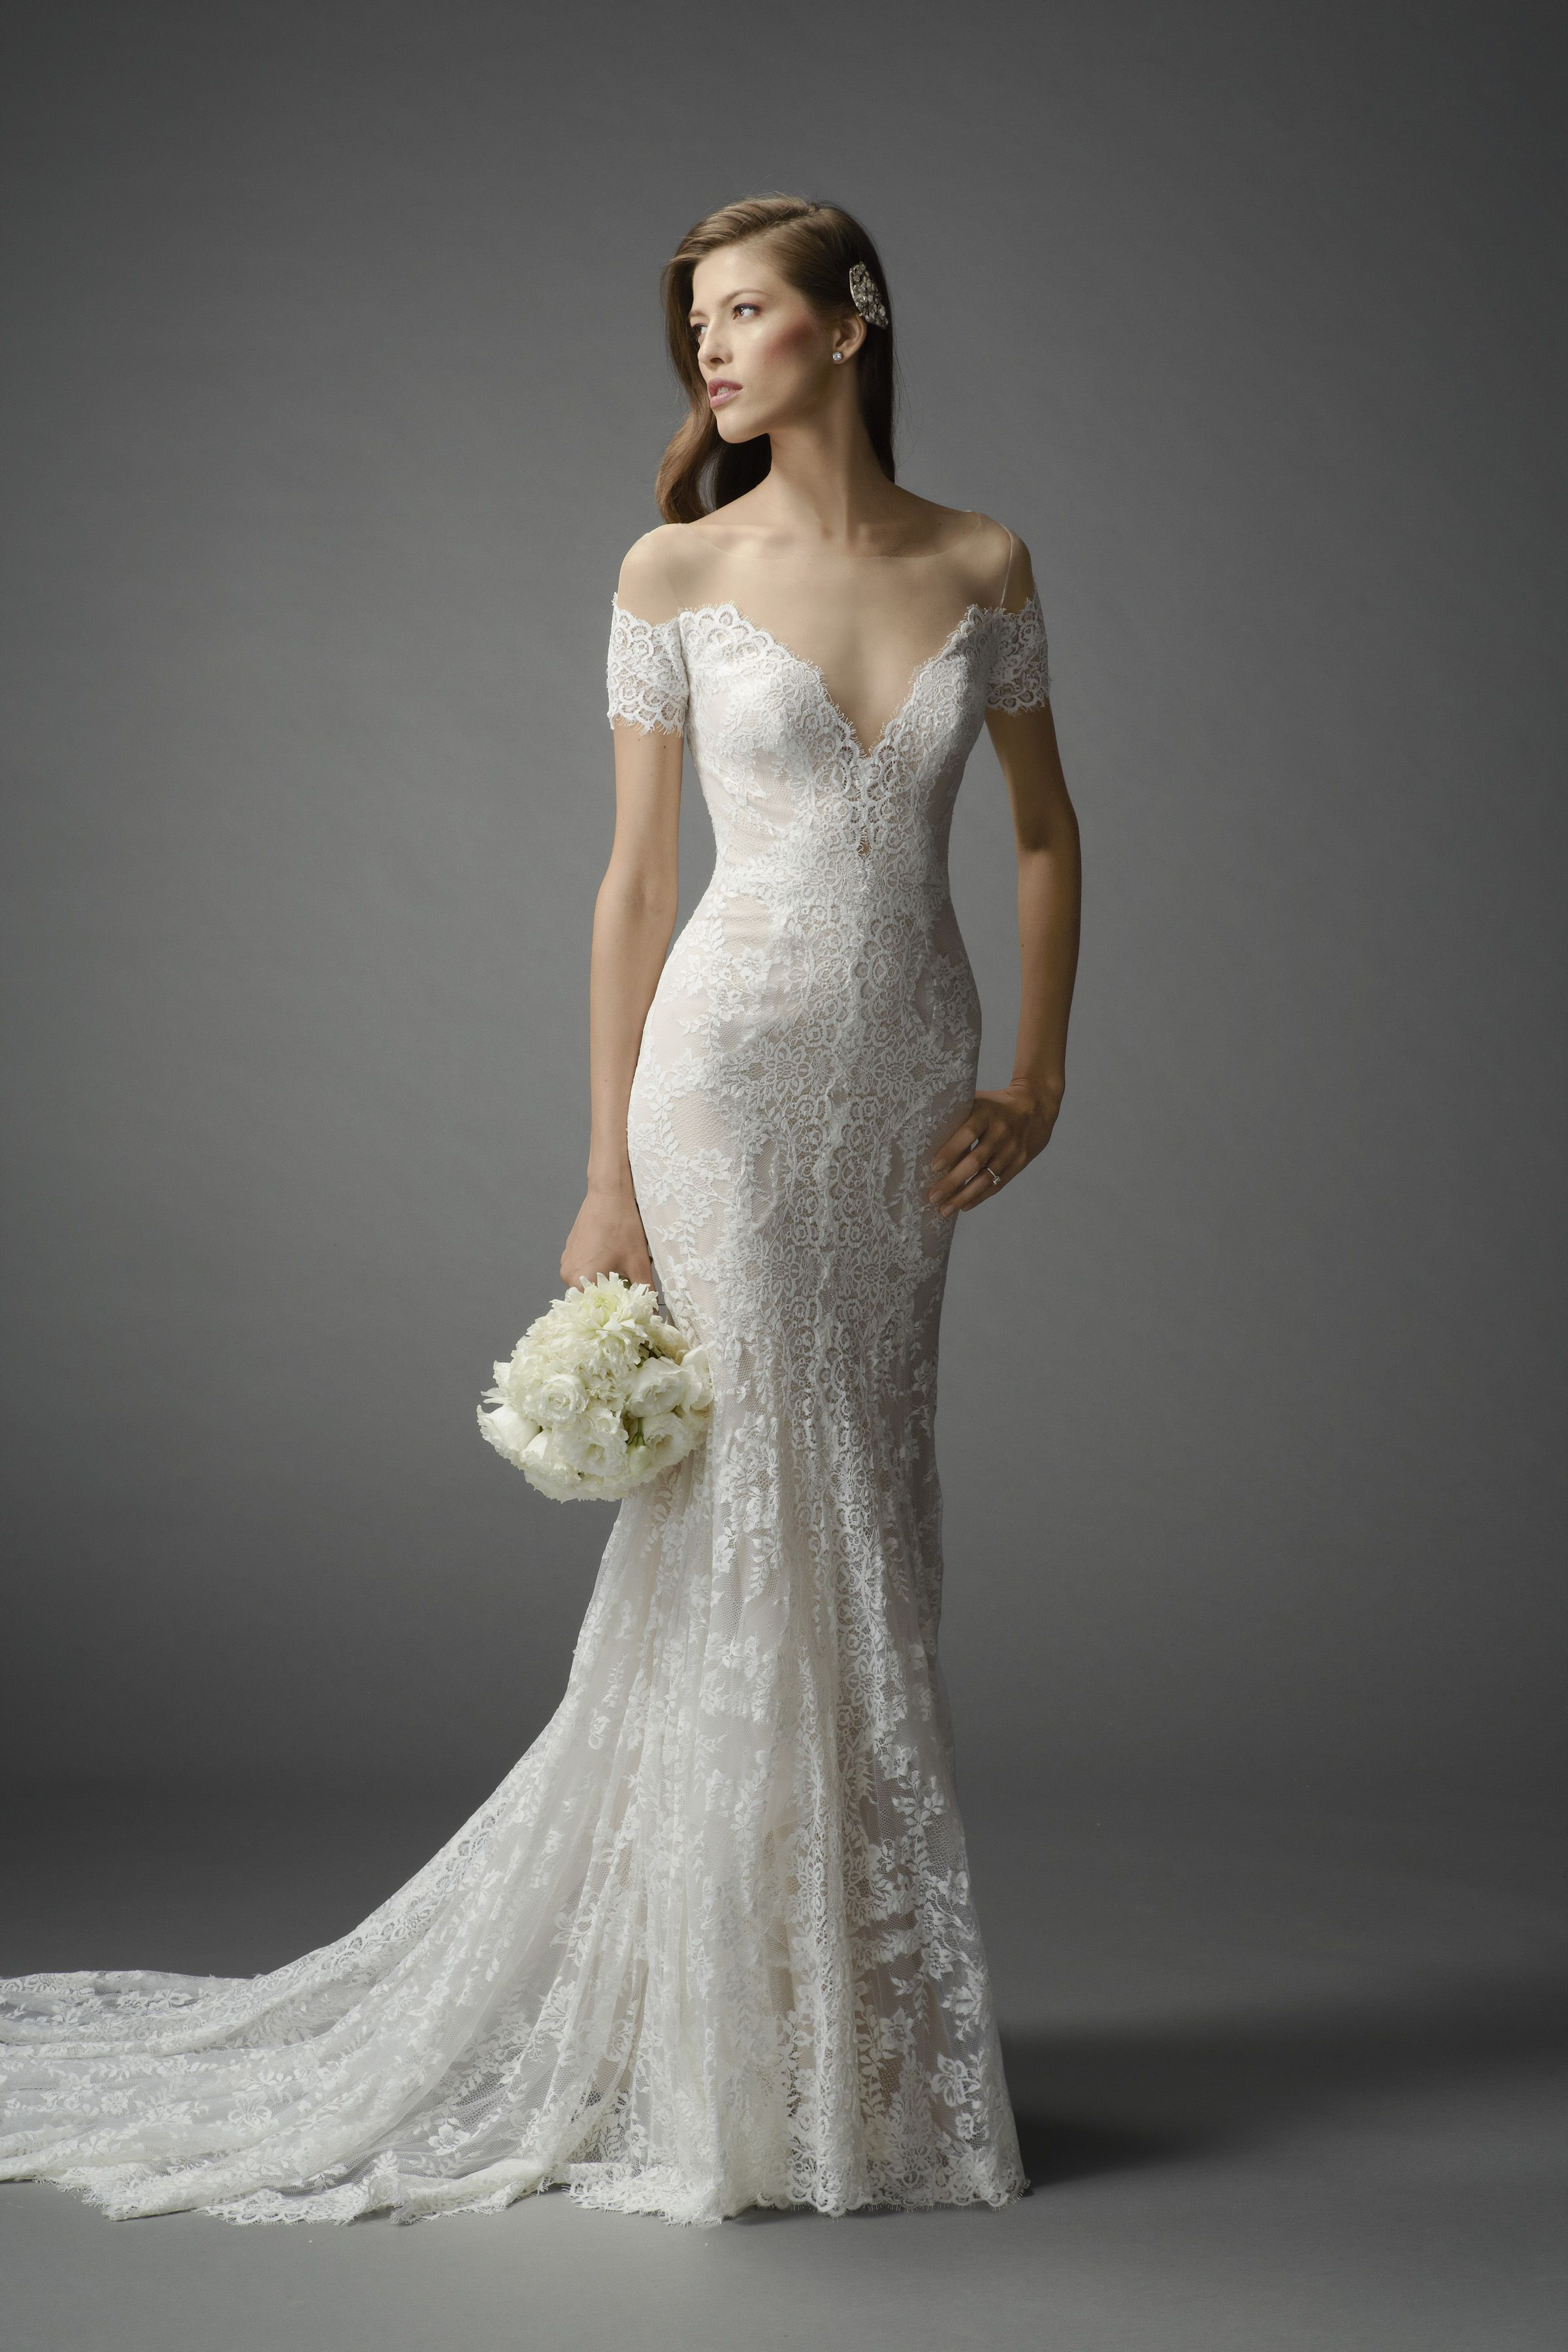 Editors pick best of watters wedding dresses gowns wedding editors pick best of watters wedding dresses ombrellifo Gallery